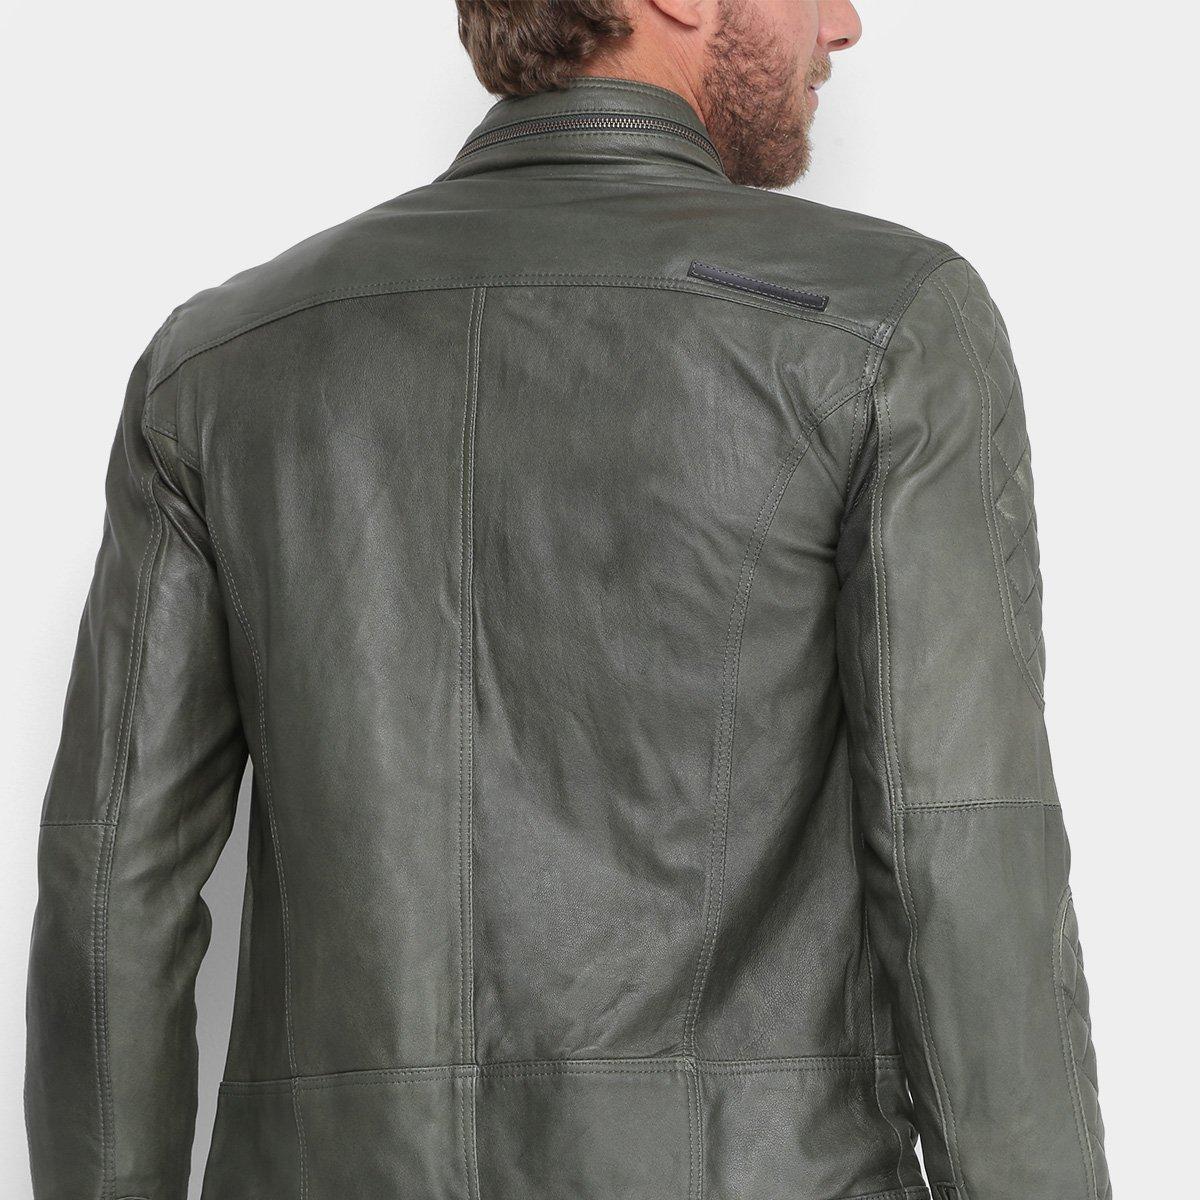 Jaqueta Couro Calvin Klein Biker Matelassê Masculina - Compre Agora ... b78a03da95